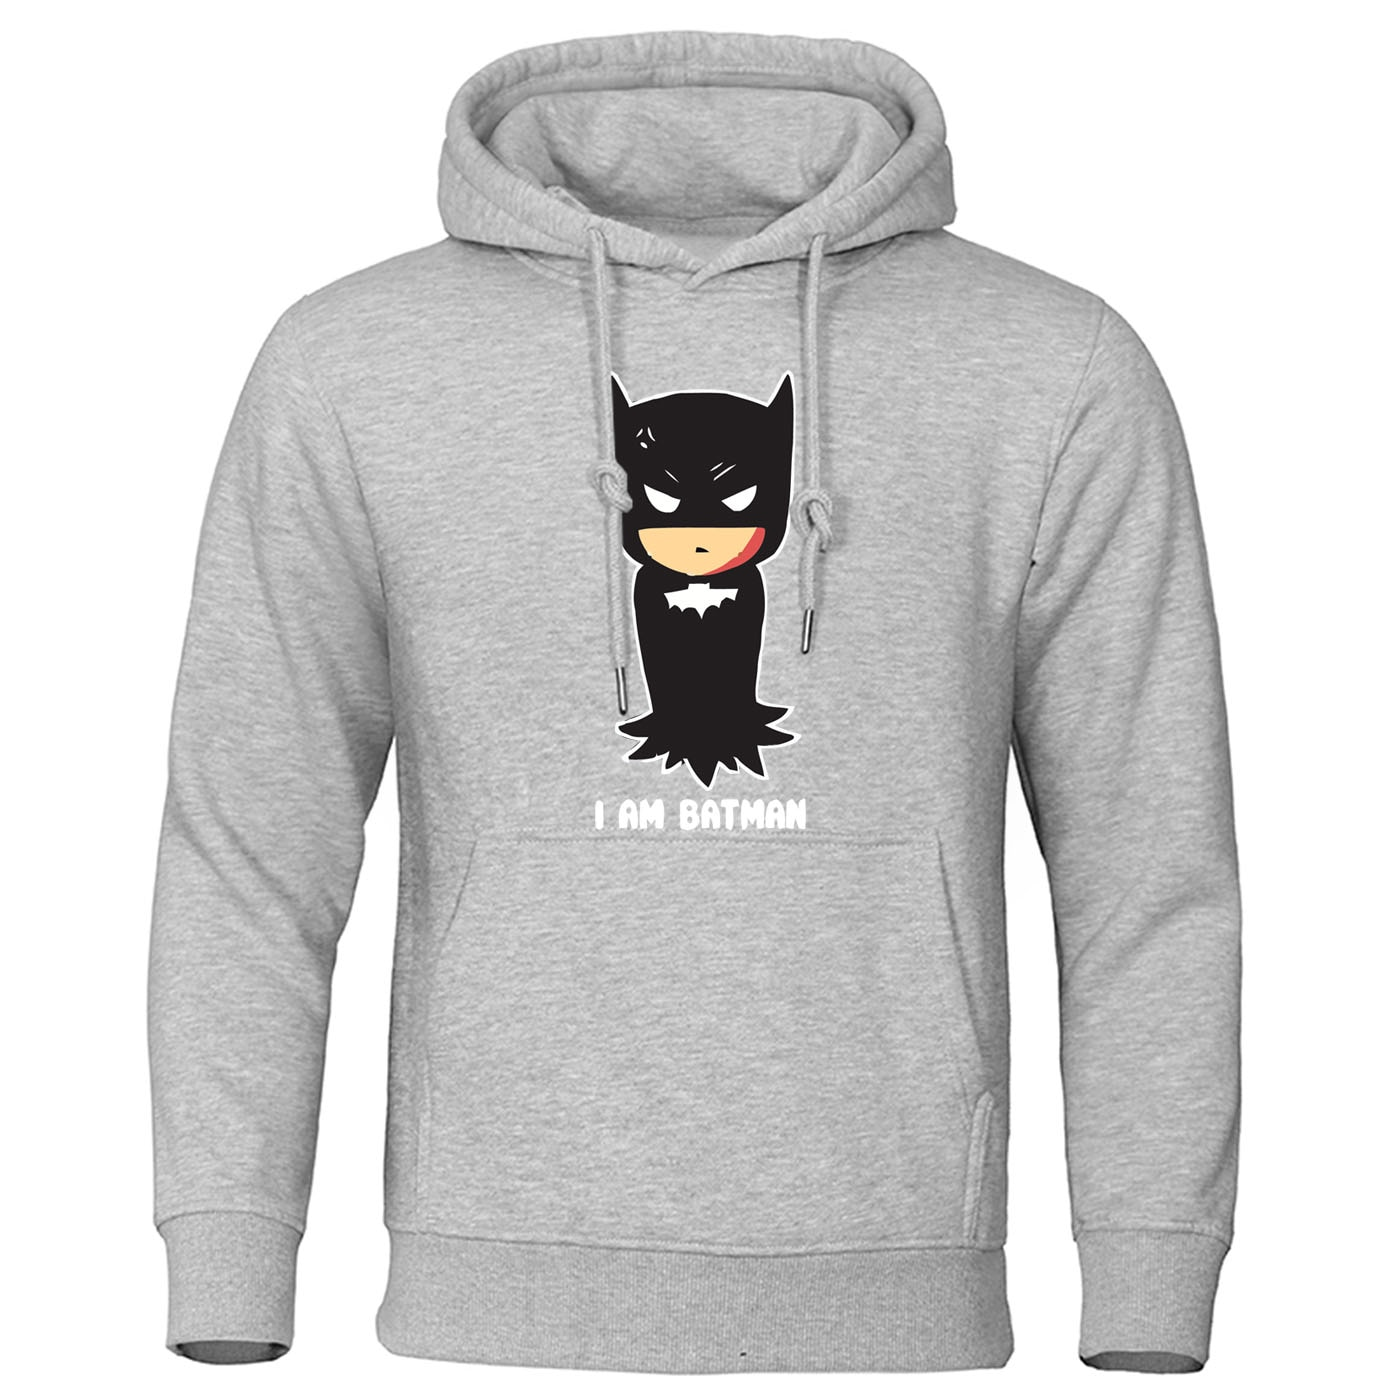 I AM Batman Print Hoodie Bruce Wayne Hoodies Men The Dark Knight Superhero Hooded Sweatshirt Autumn Bat Man Harajuku Sportswear